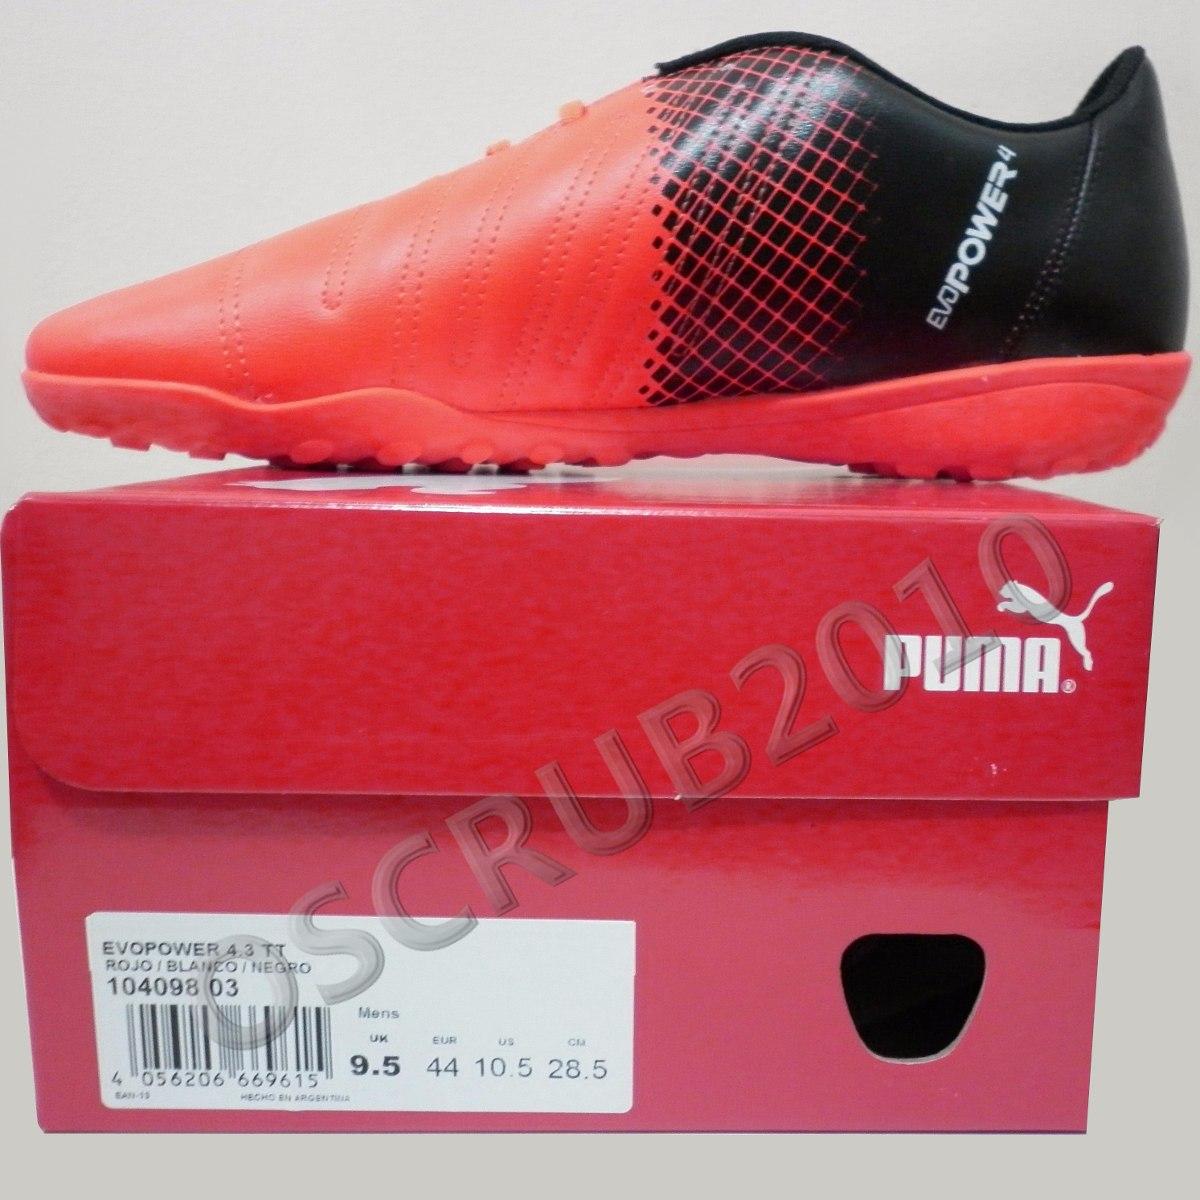 00947b9c Botines Puma Evopower 4.3 Tt Papi Fútbol Oferta! - $ 949,00 en ...